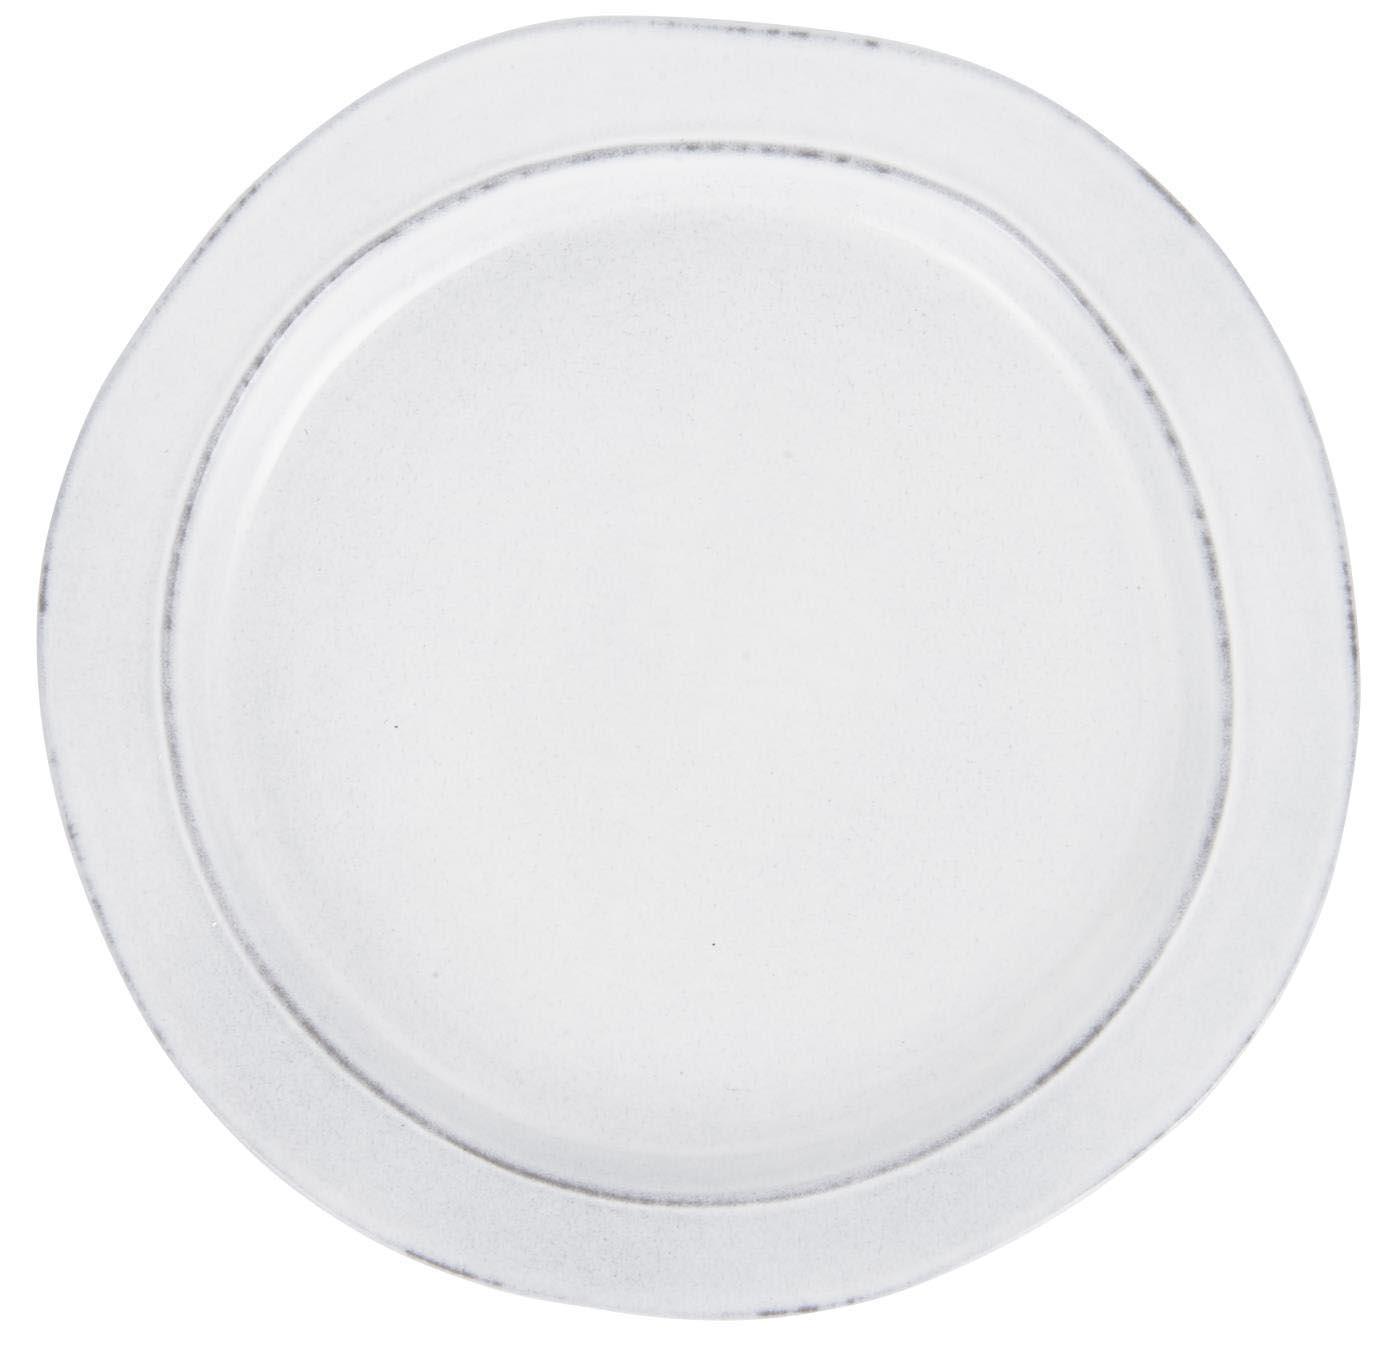 ib laursen Ib laursen frokosttallerken - gråt stentøj fra boboonline.dk